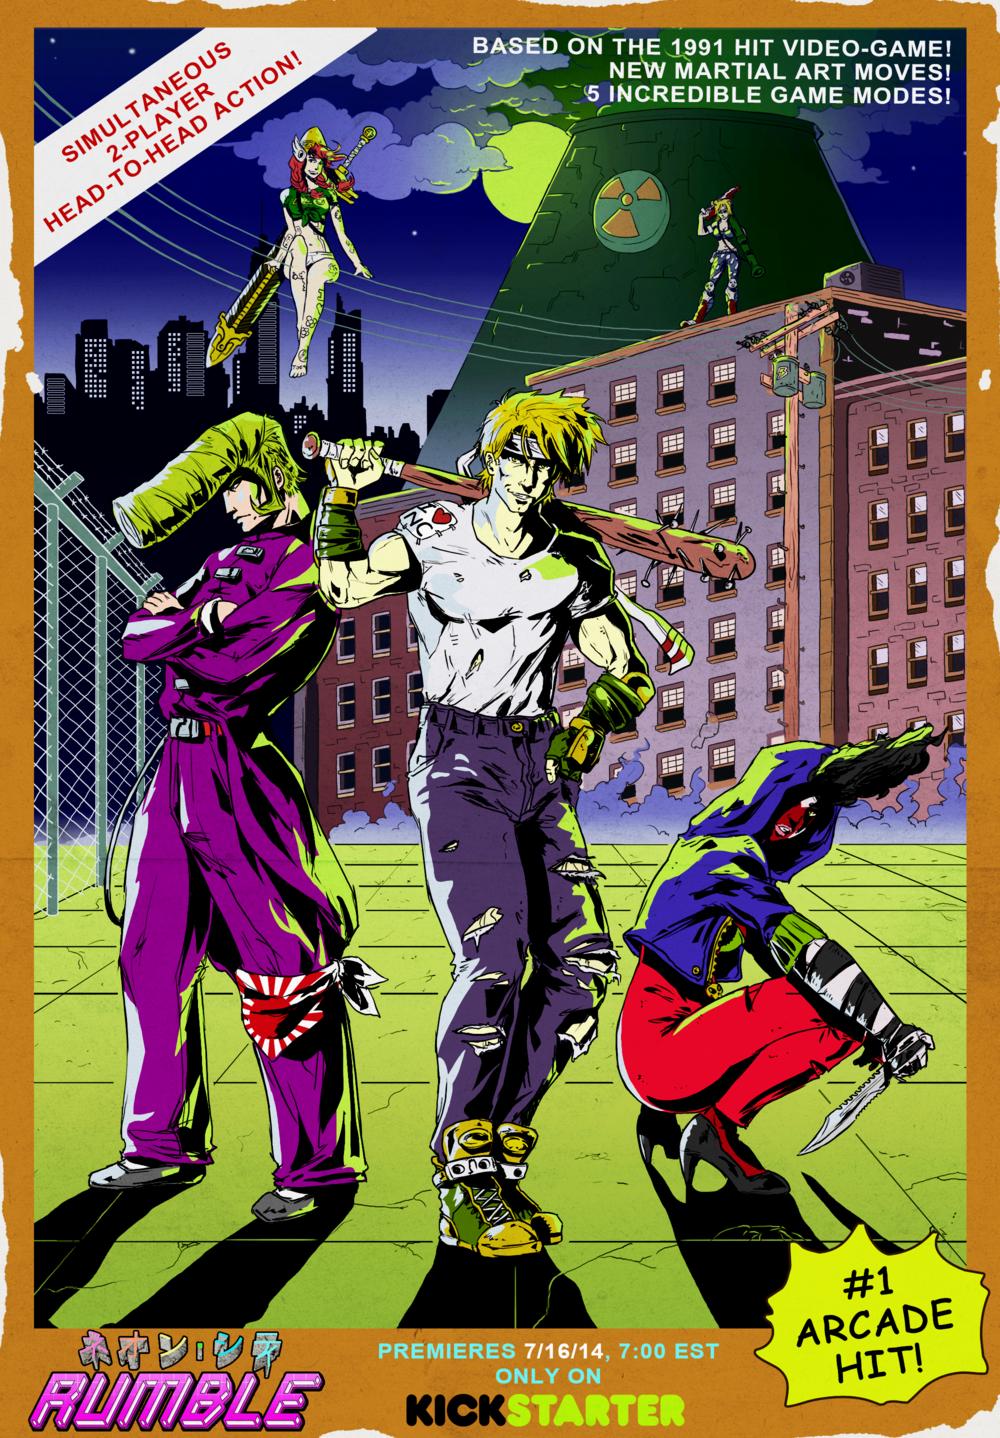 """NCR Retro Poster"" by Davy Wagnarok, 2014."